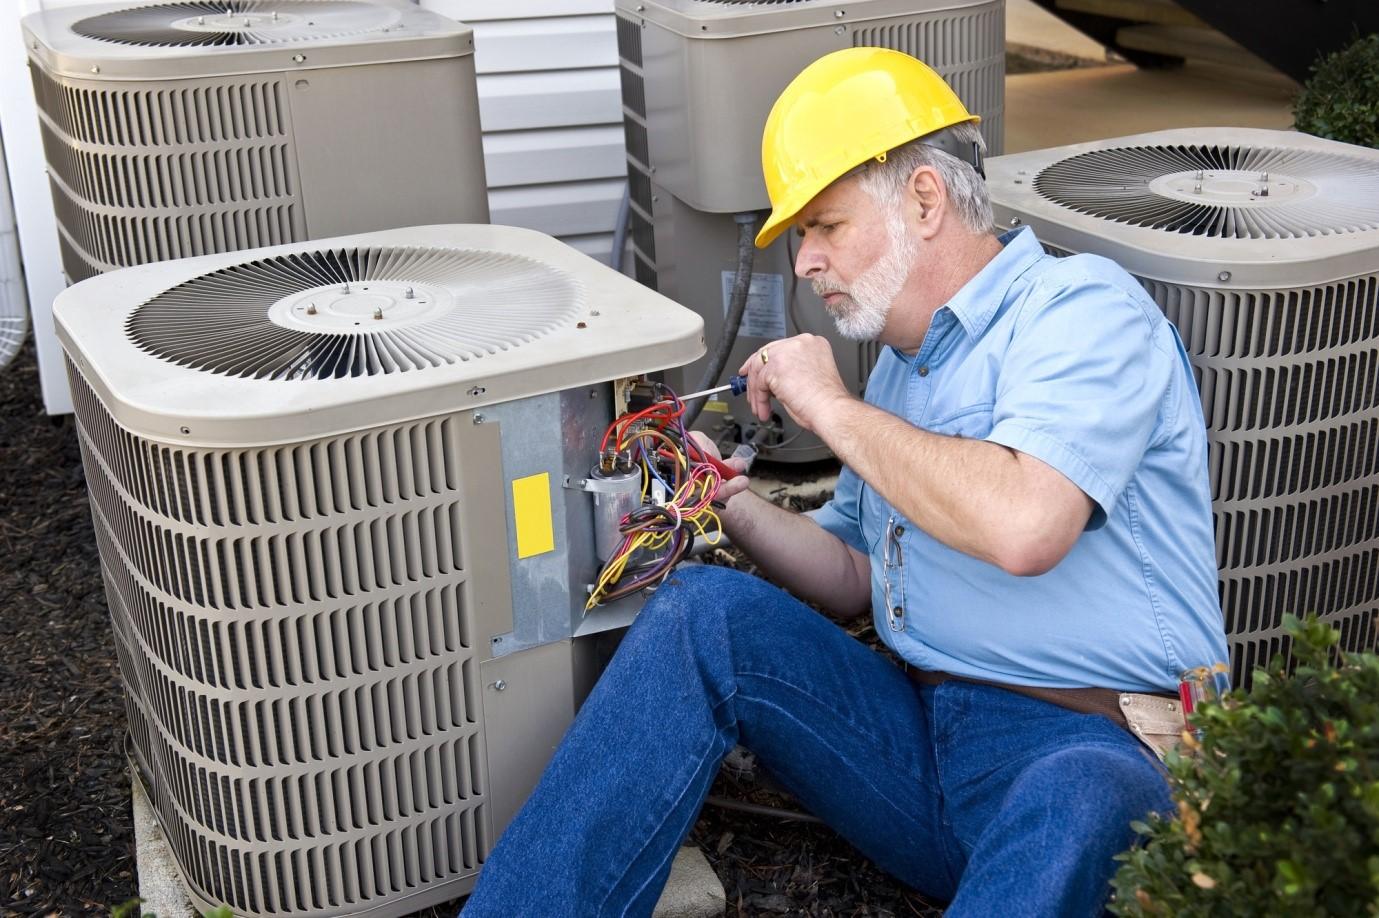 Cool Runnings: 5 Benefits of Regular Air Conditioning Preventive Maintenance